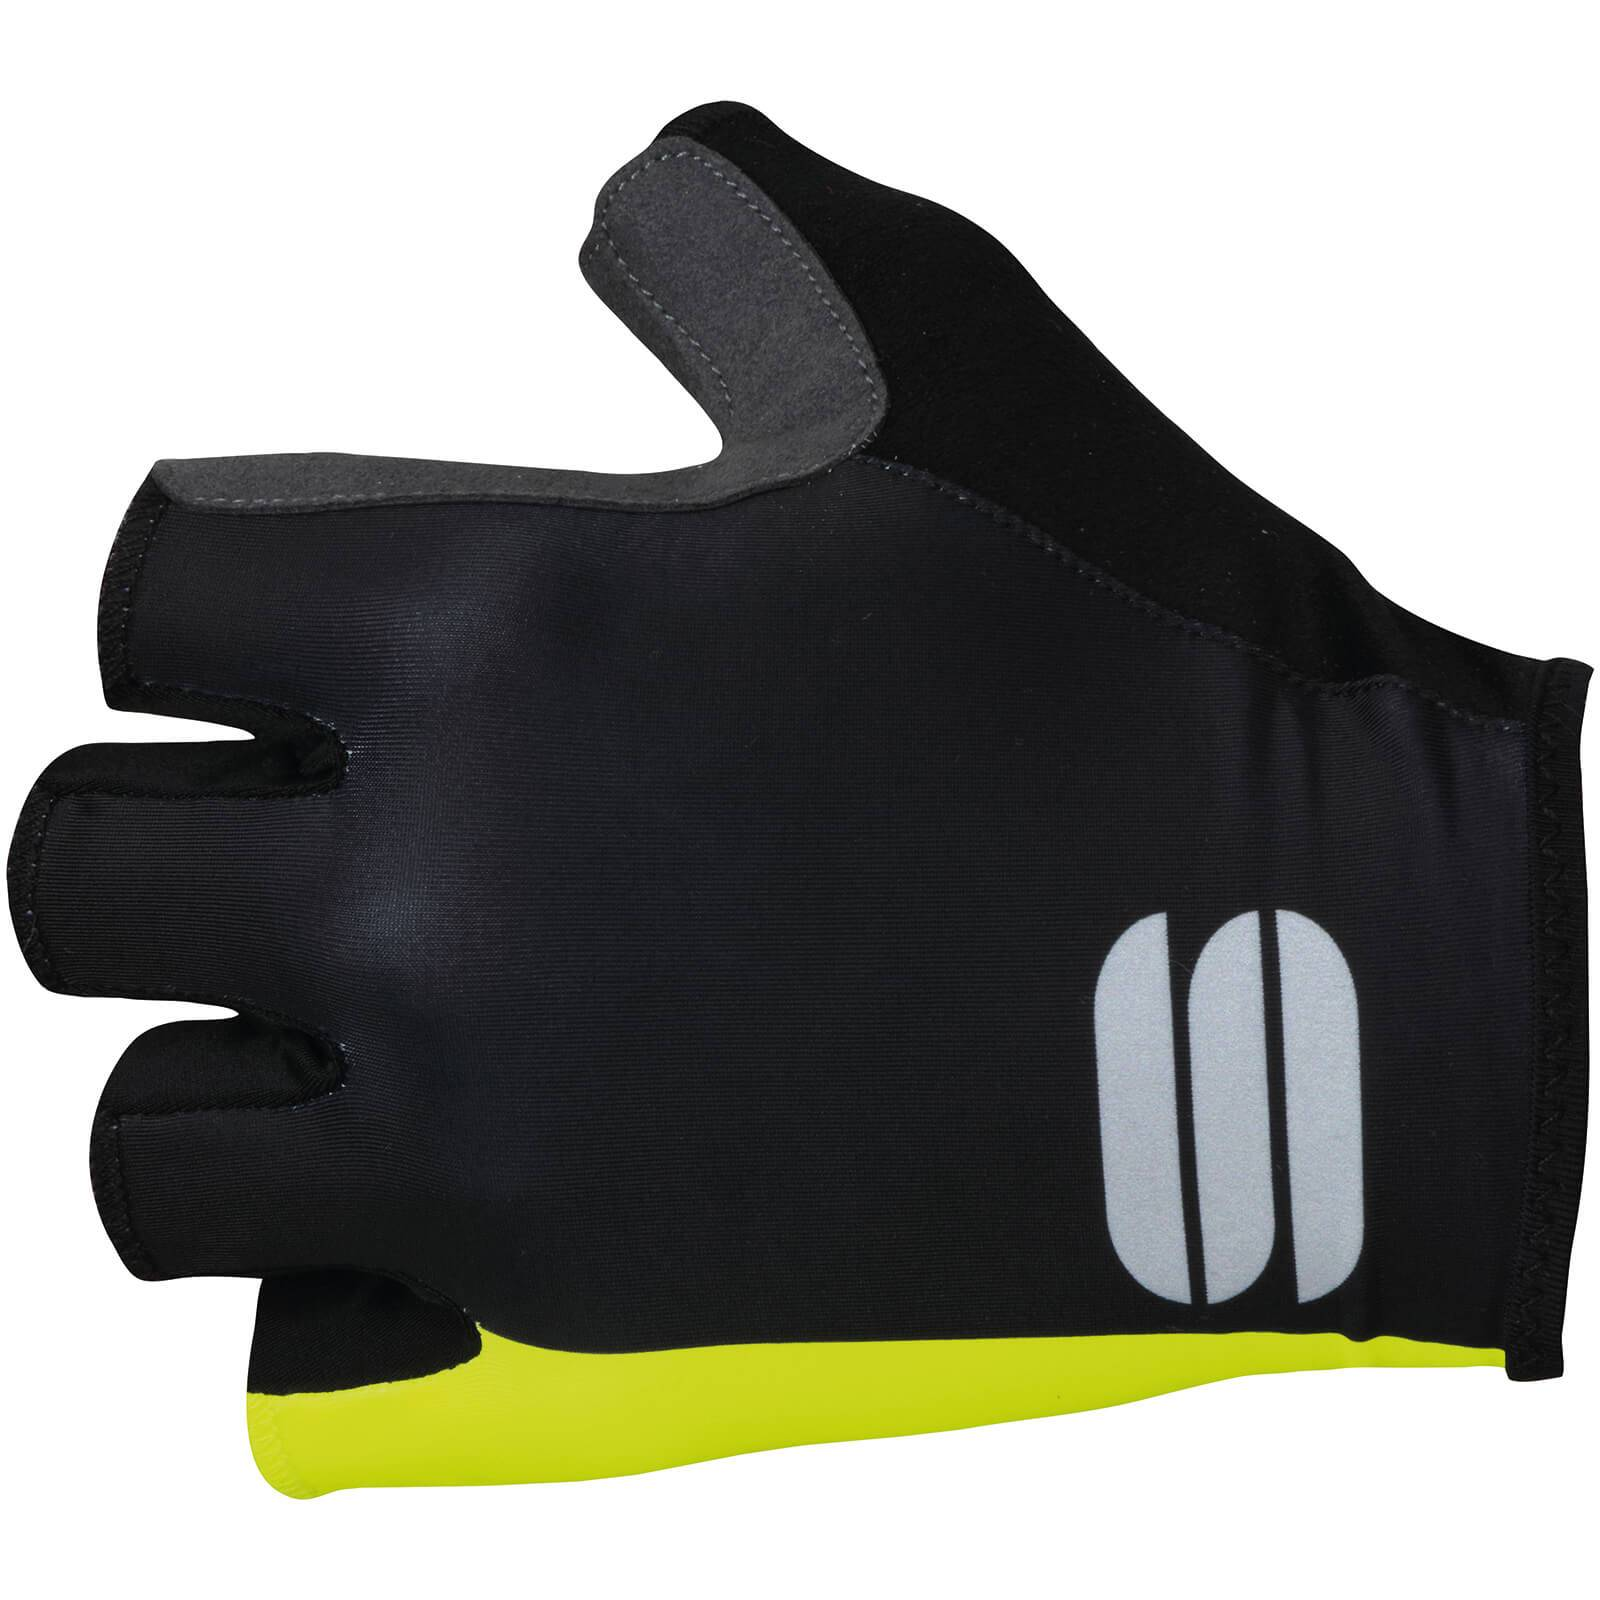 Sportful BodyFit Pro Gloves - XL - Black/Yellow Fluo